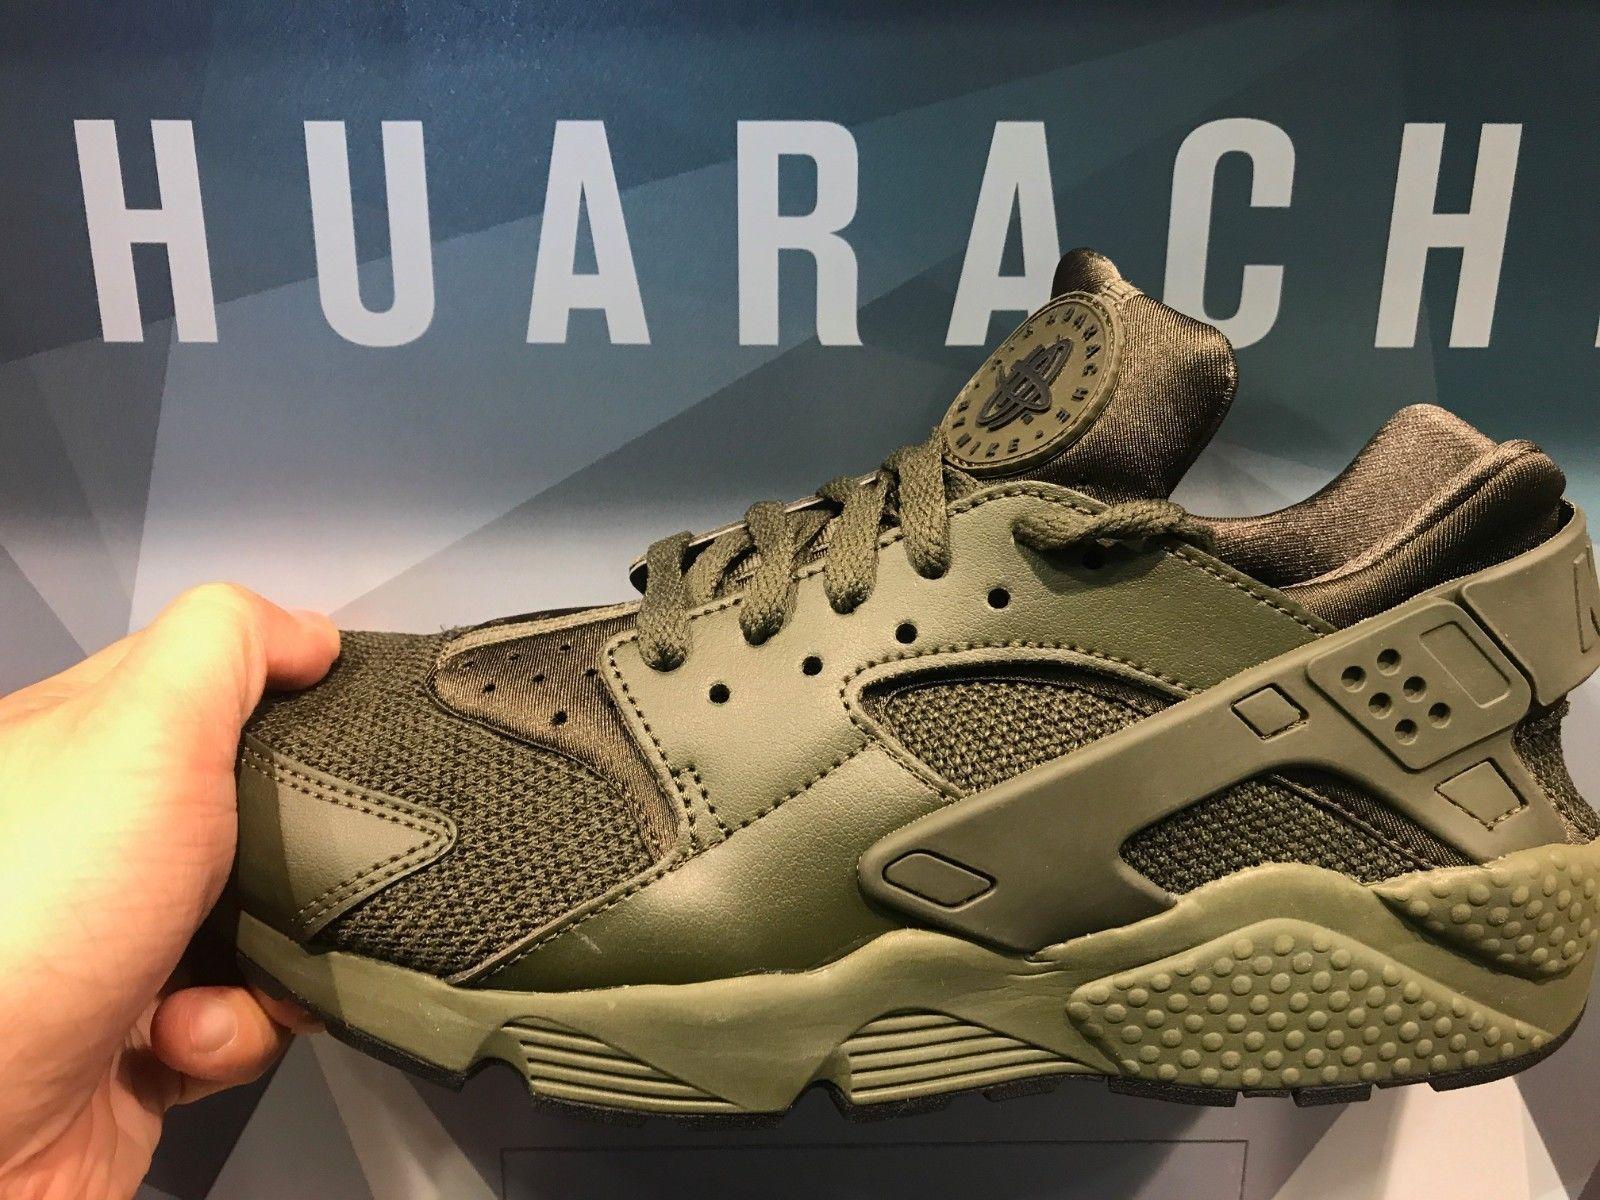 Men 158971: Nike Air Huarache Olive Camo Men Sizes -> BUY IT NOW ONLY